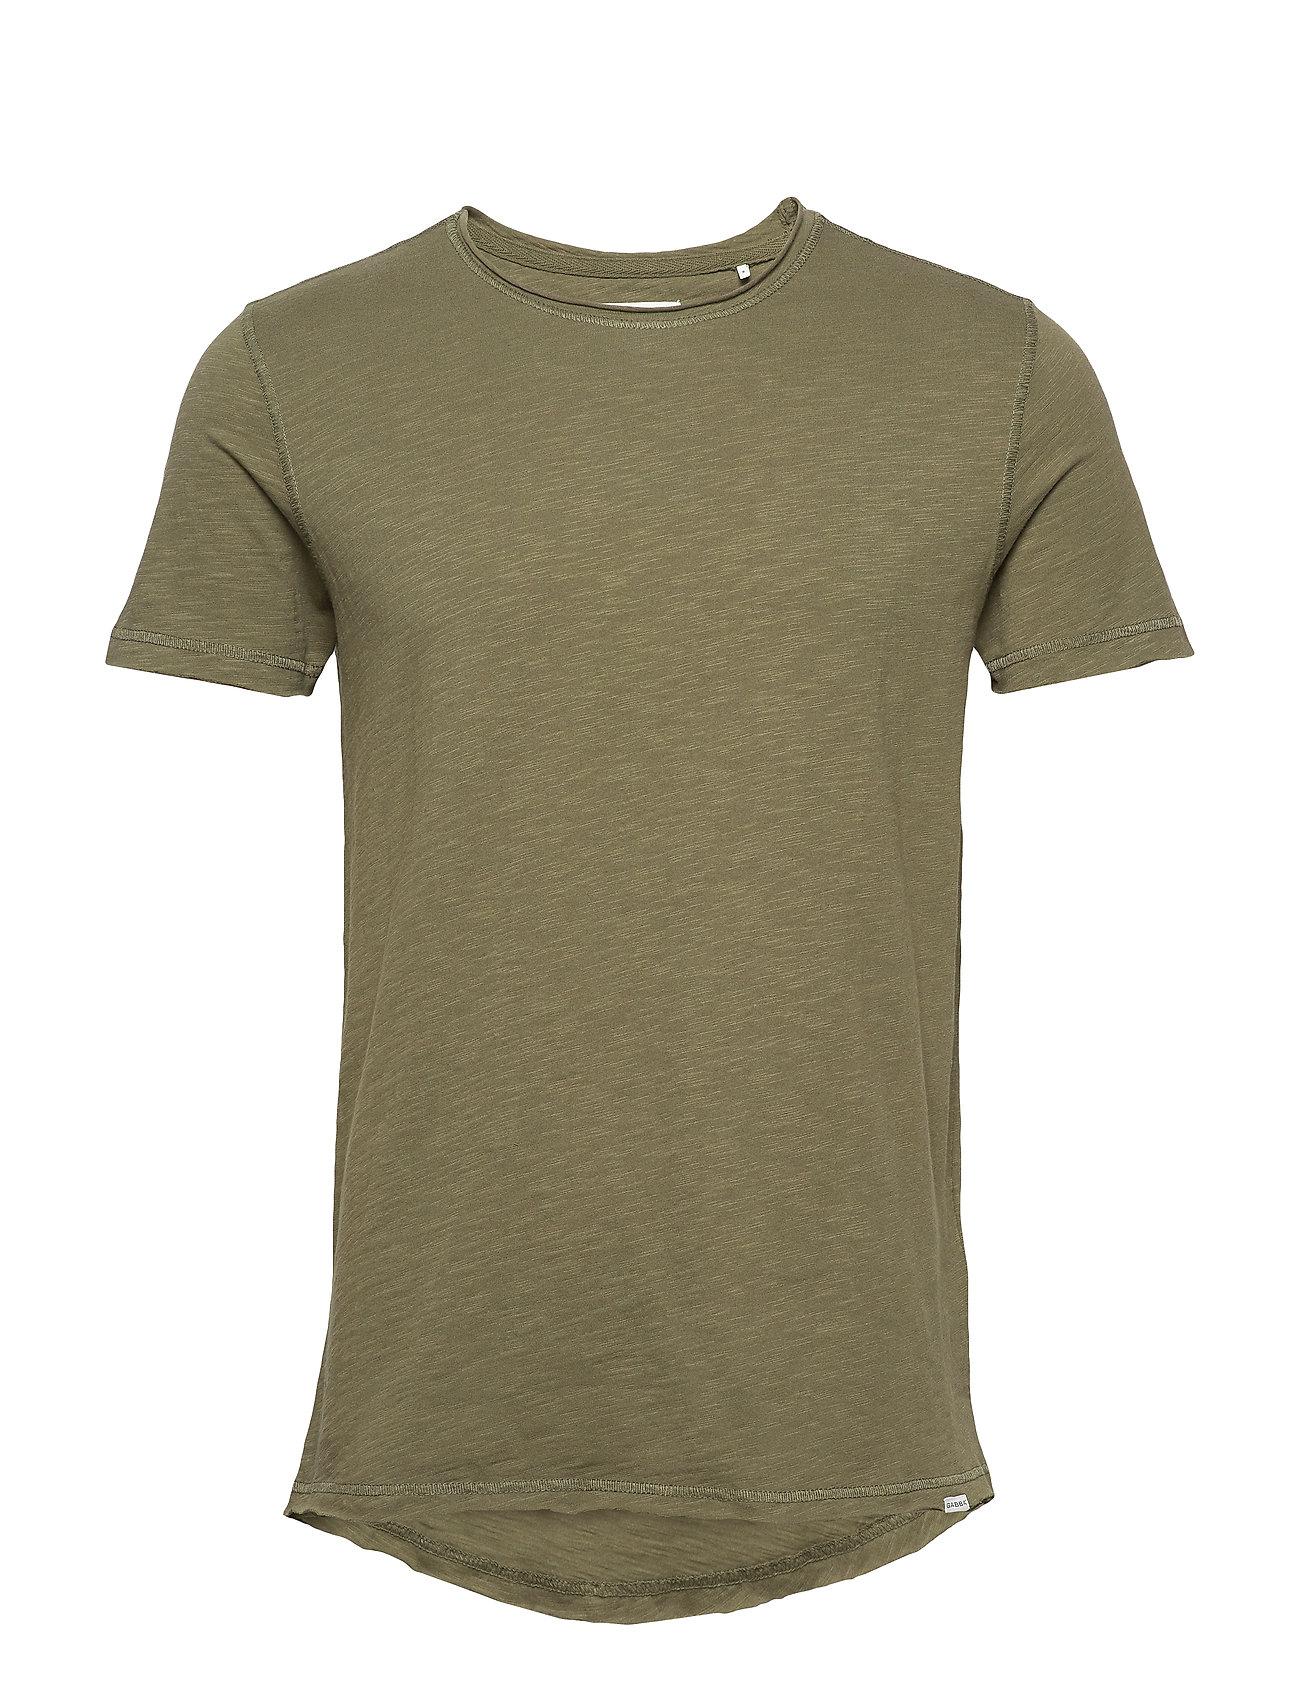 Image of Konrad Slub S/S Tee T-shirt Grøn Gabba (3309710587)